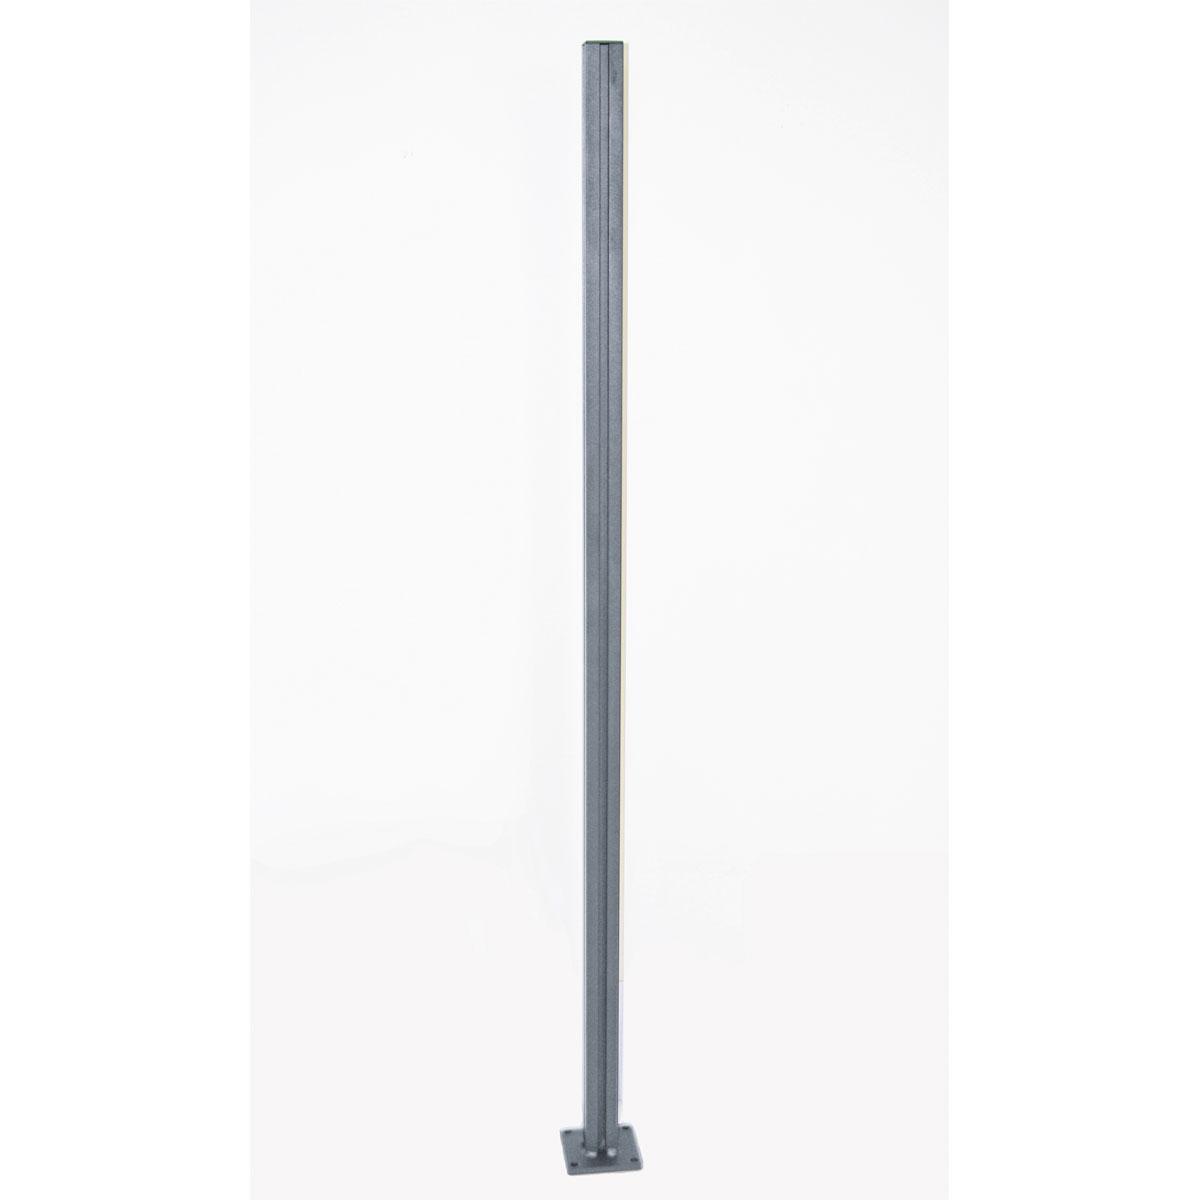 Durabil Universalpfosten für Glaswindschutz, Aluminium